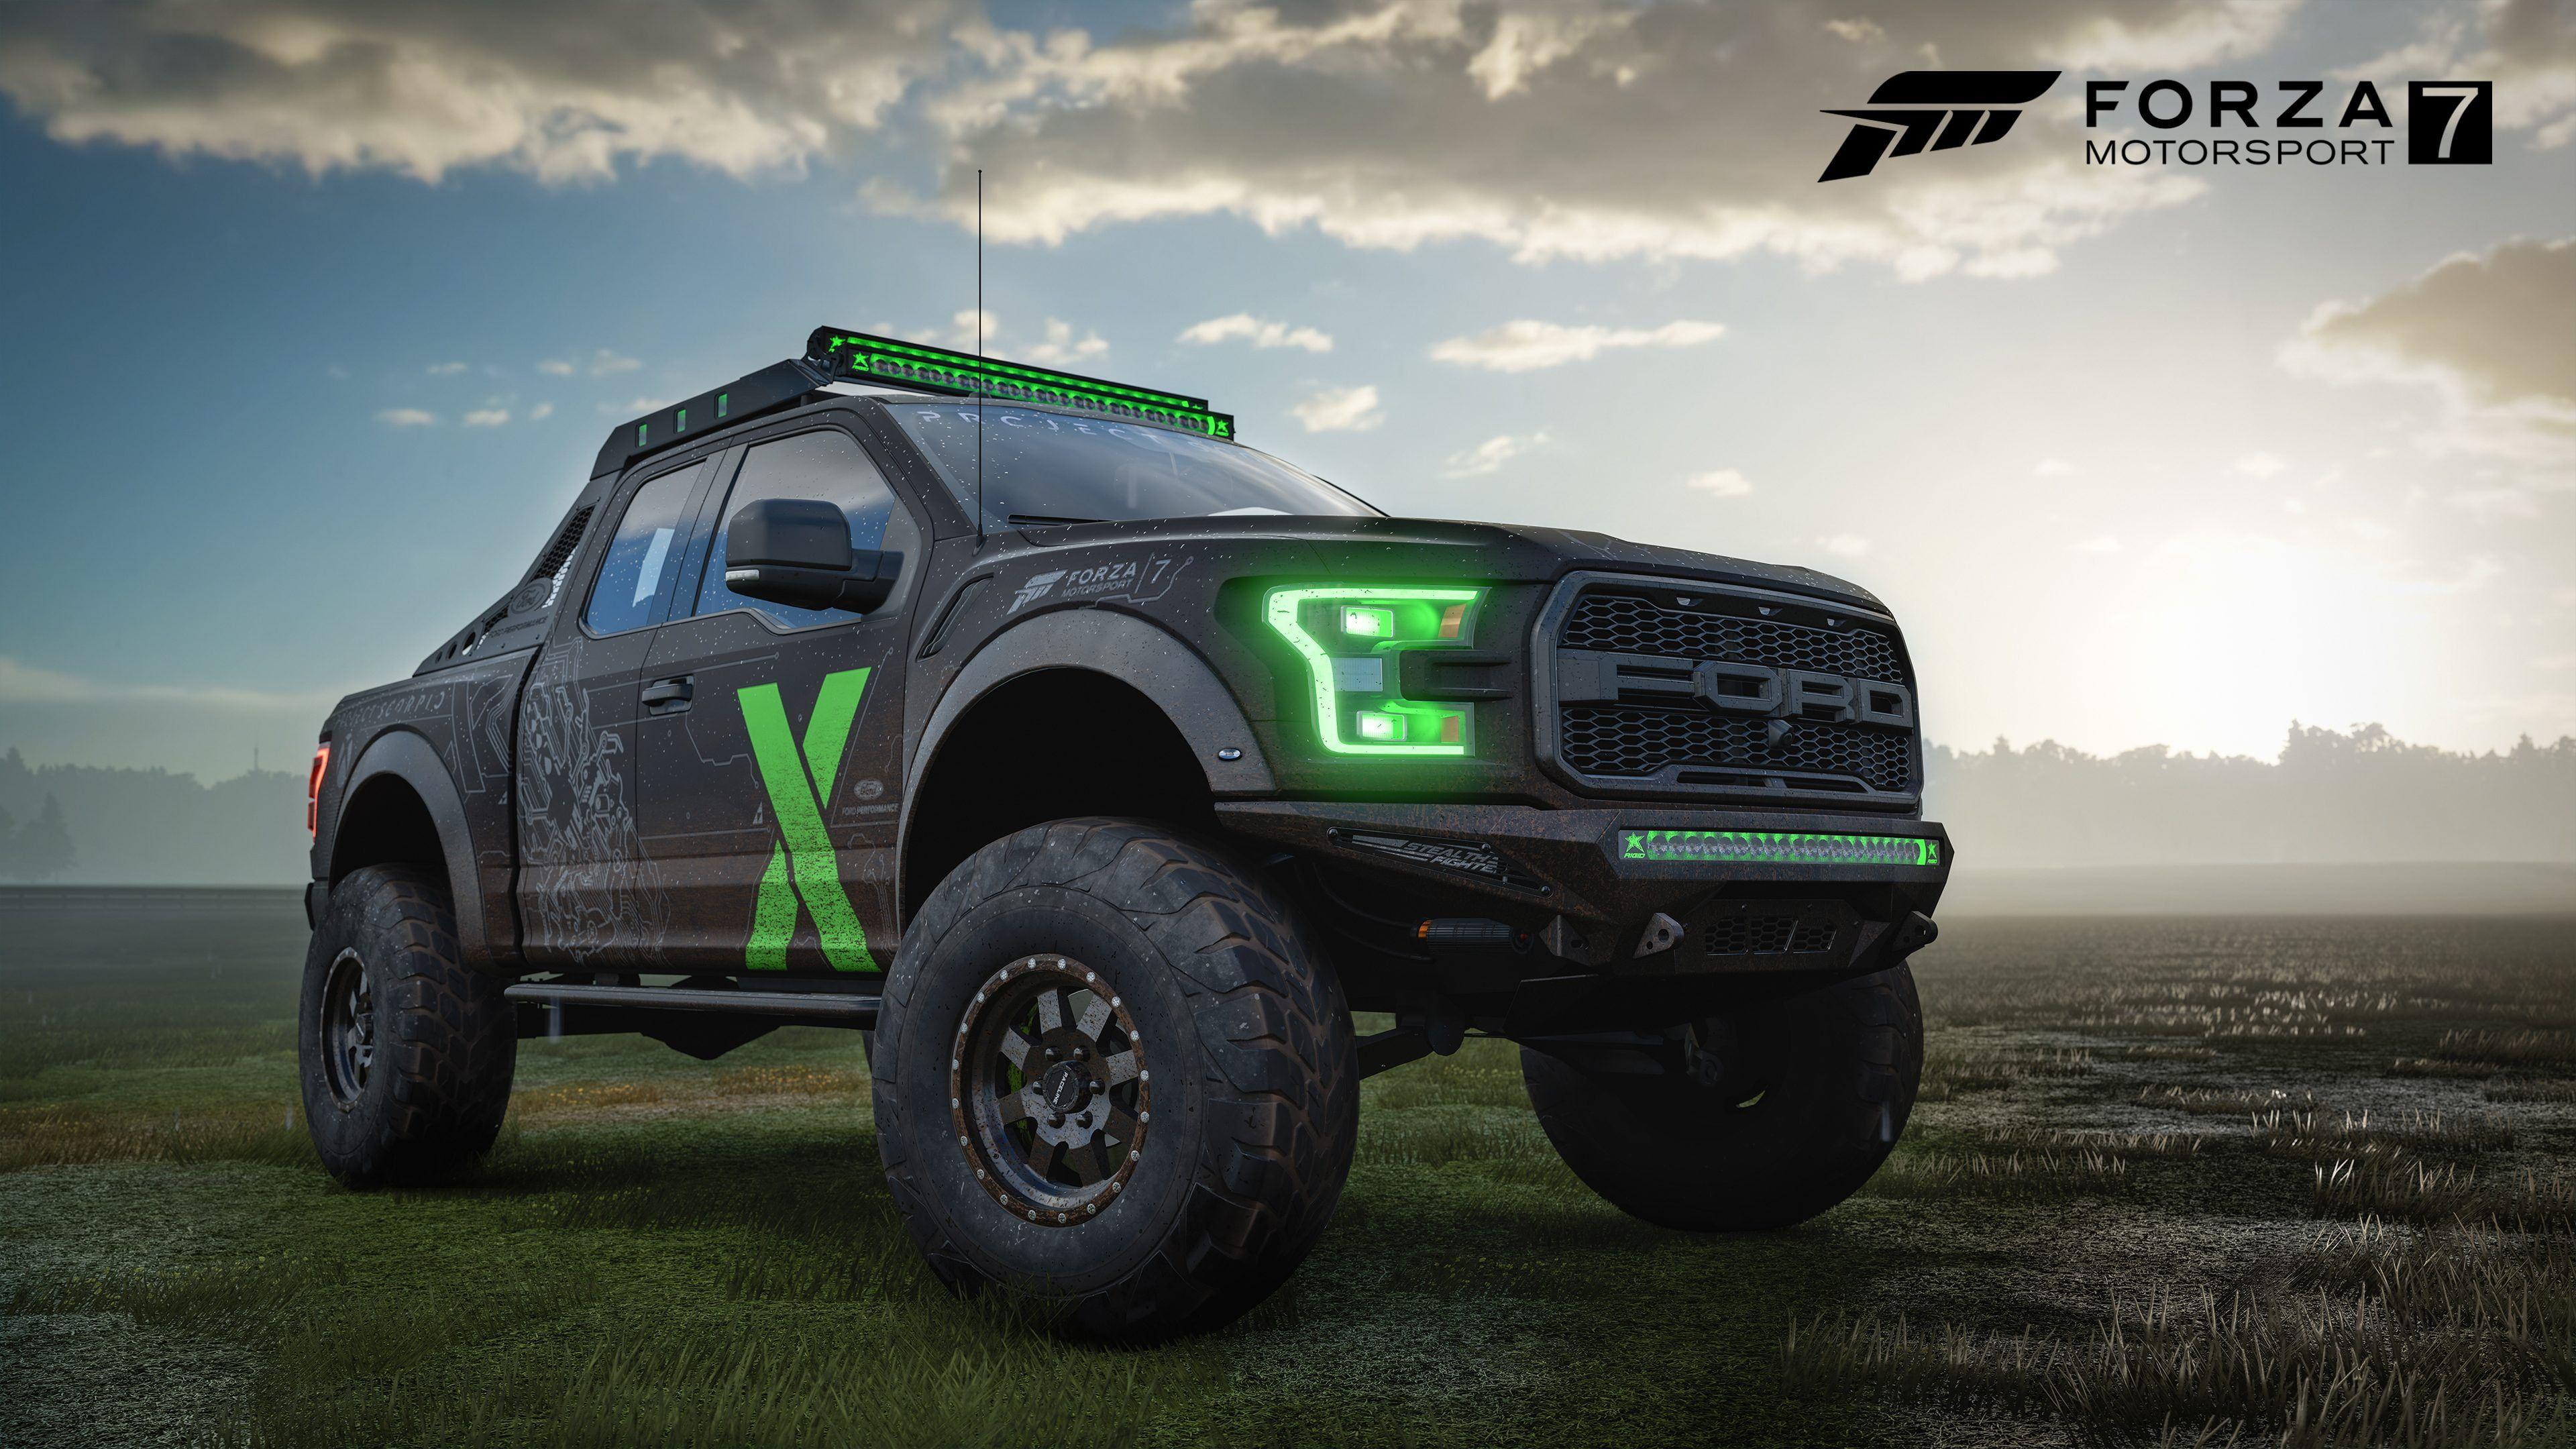 Forza Ford Raptor F150 Raptor Xbox Ford Car Truck Forza Motorsport 7 Video Game Art 4k Wallpaper Hdwallpaper Desktop Forza Motorsport Motorsport Forza